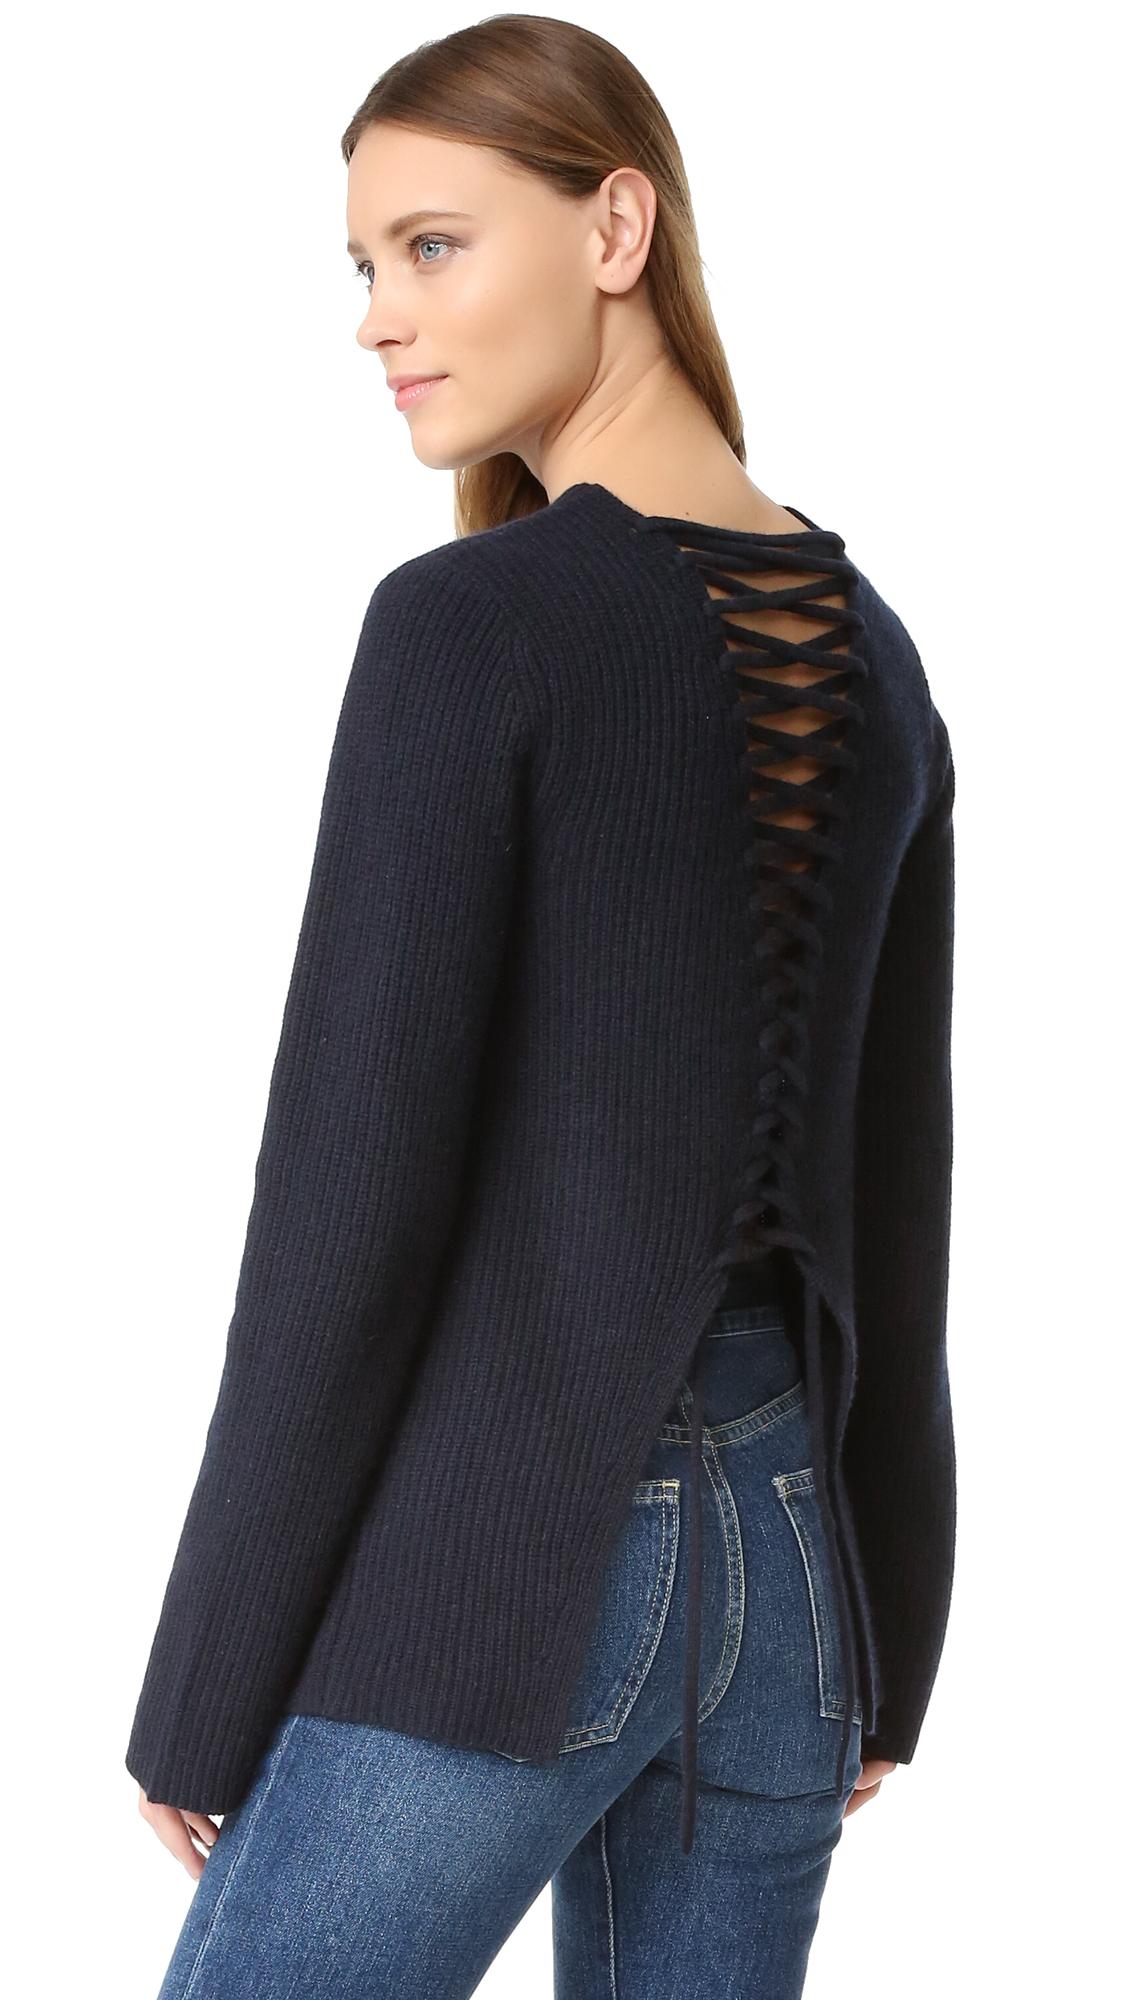 A.L.C. Markell Sweater - Midnight at Shopbop